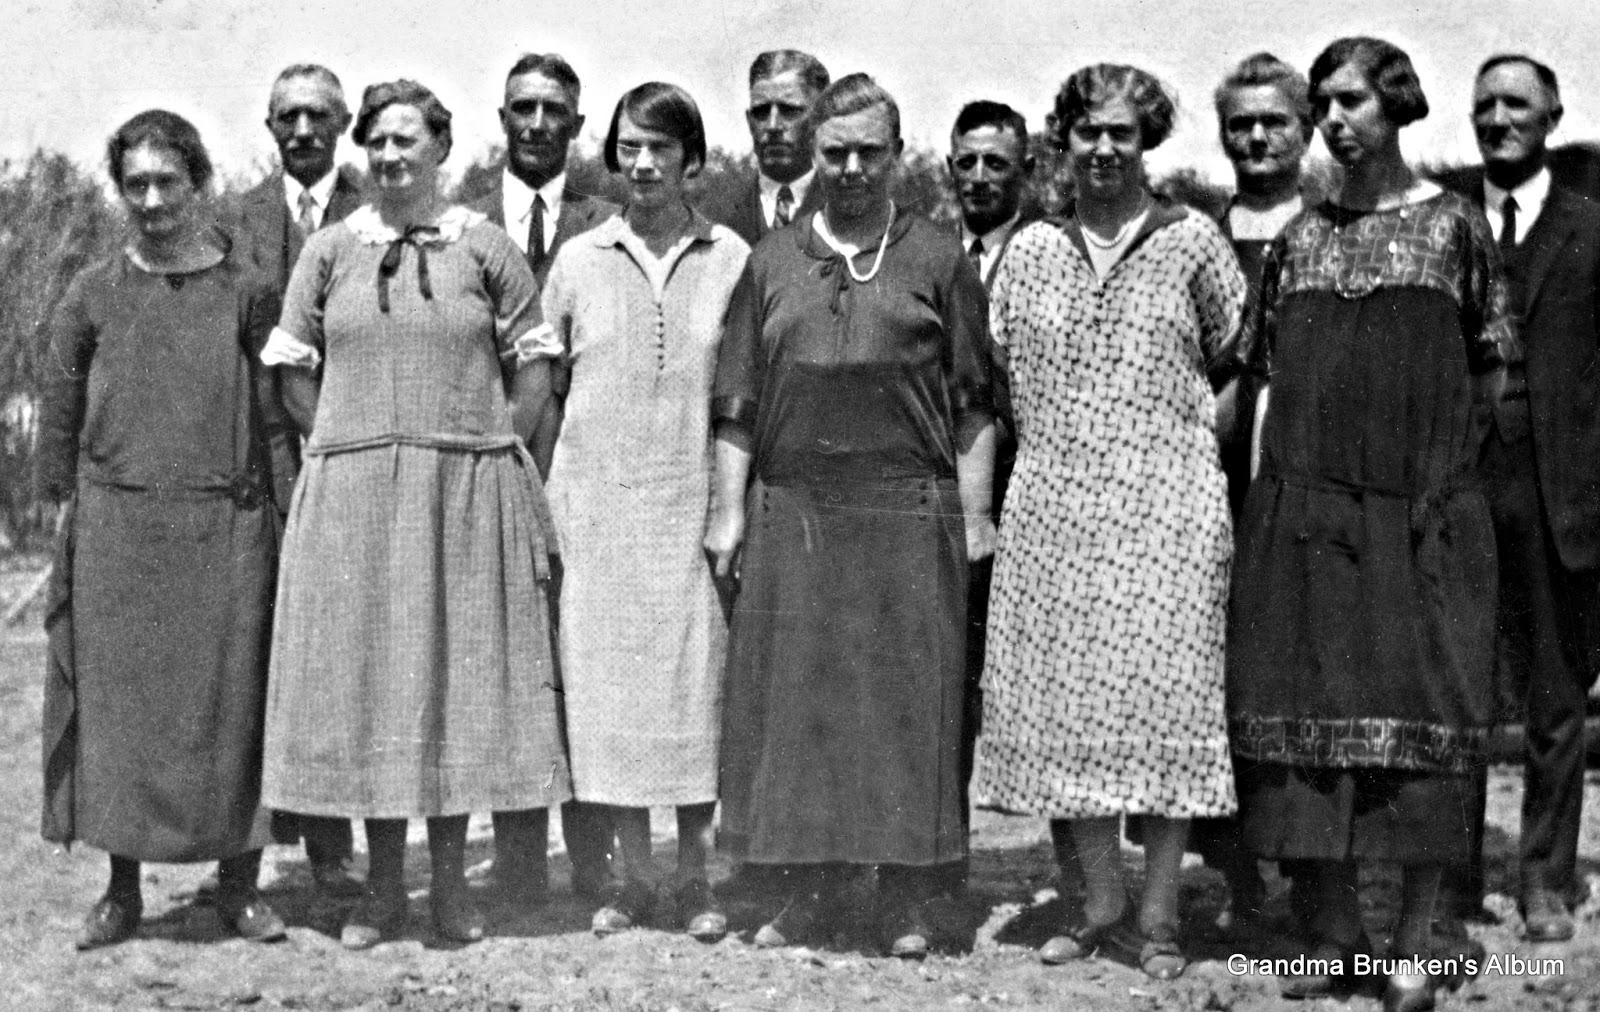 Carsten Petersen, Sr.'s Children with Spouses - Circa 1925